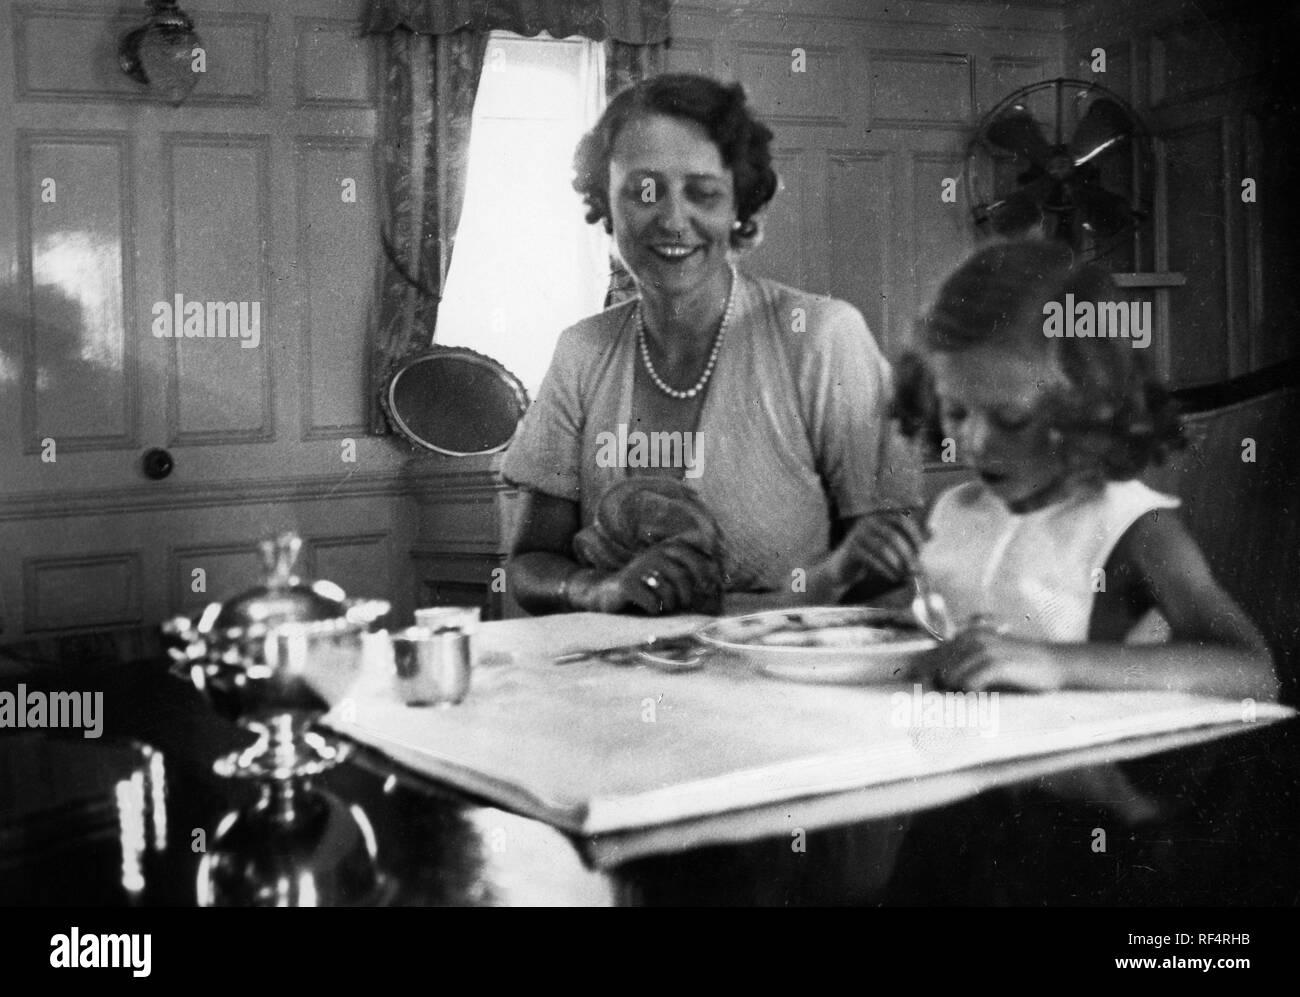 elettra marconi and mum, 1936 Stock Photo